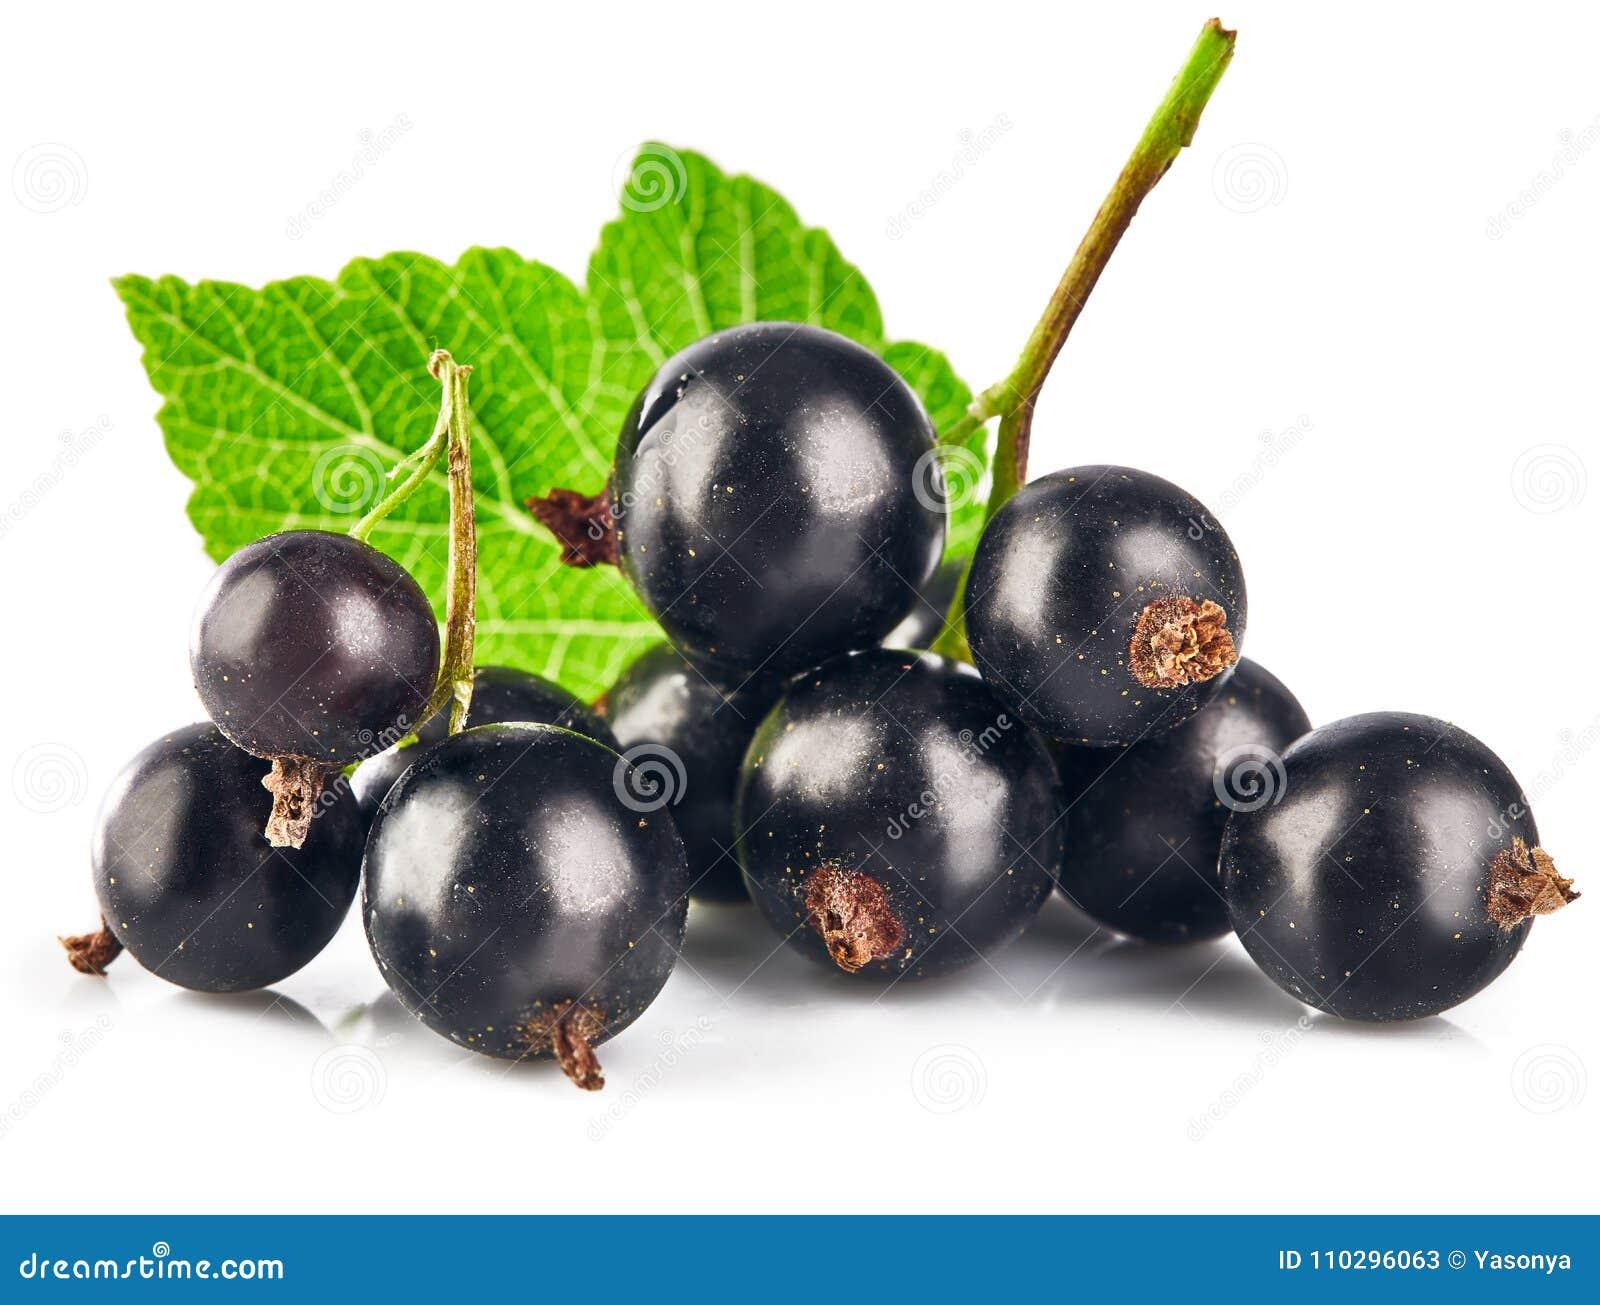 Berries black currant with green leaf fresh